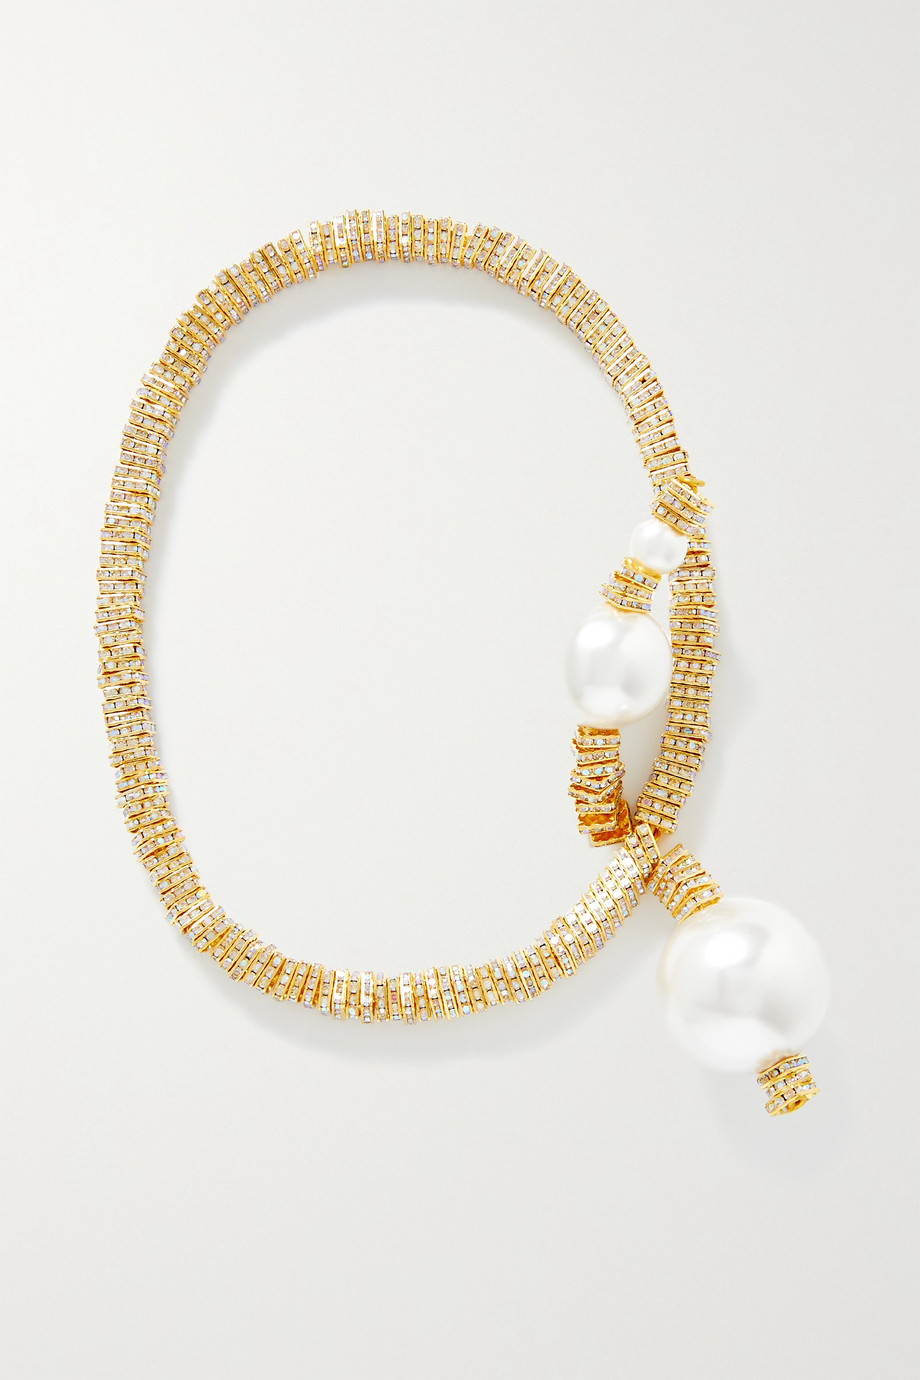 PEARL OCTOPUSS.Y Collier convertible en plaqué or, cristaux et perles synthétiques Golden Snake